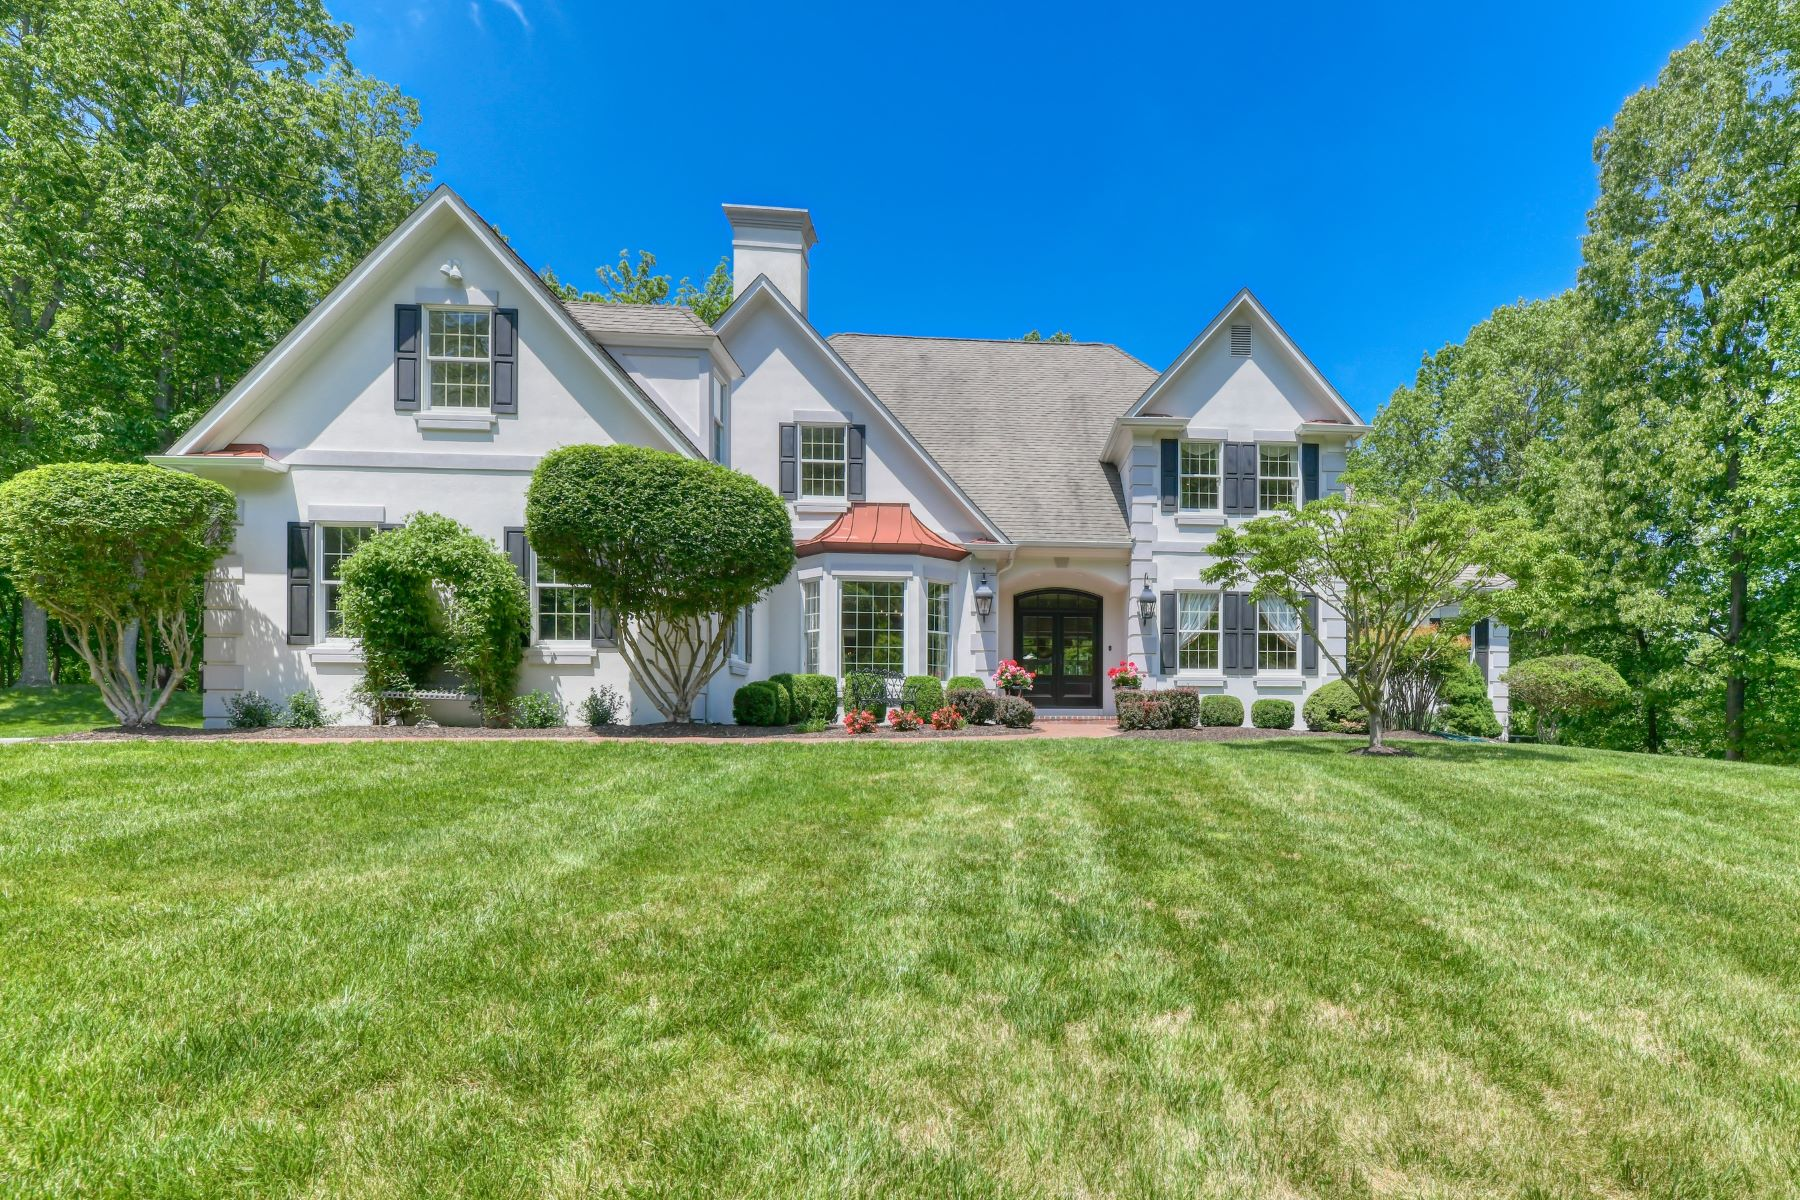 Single Family Homes για την Πώληση στο Spectacular Custom-Built Home in Laurelford 13050 Jerome Jay Drive, Cockeysville, Μεριλαντ 21030 Ηνωμένες Πολιτείες